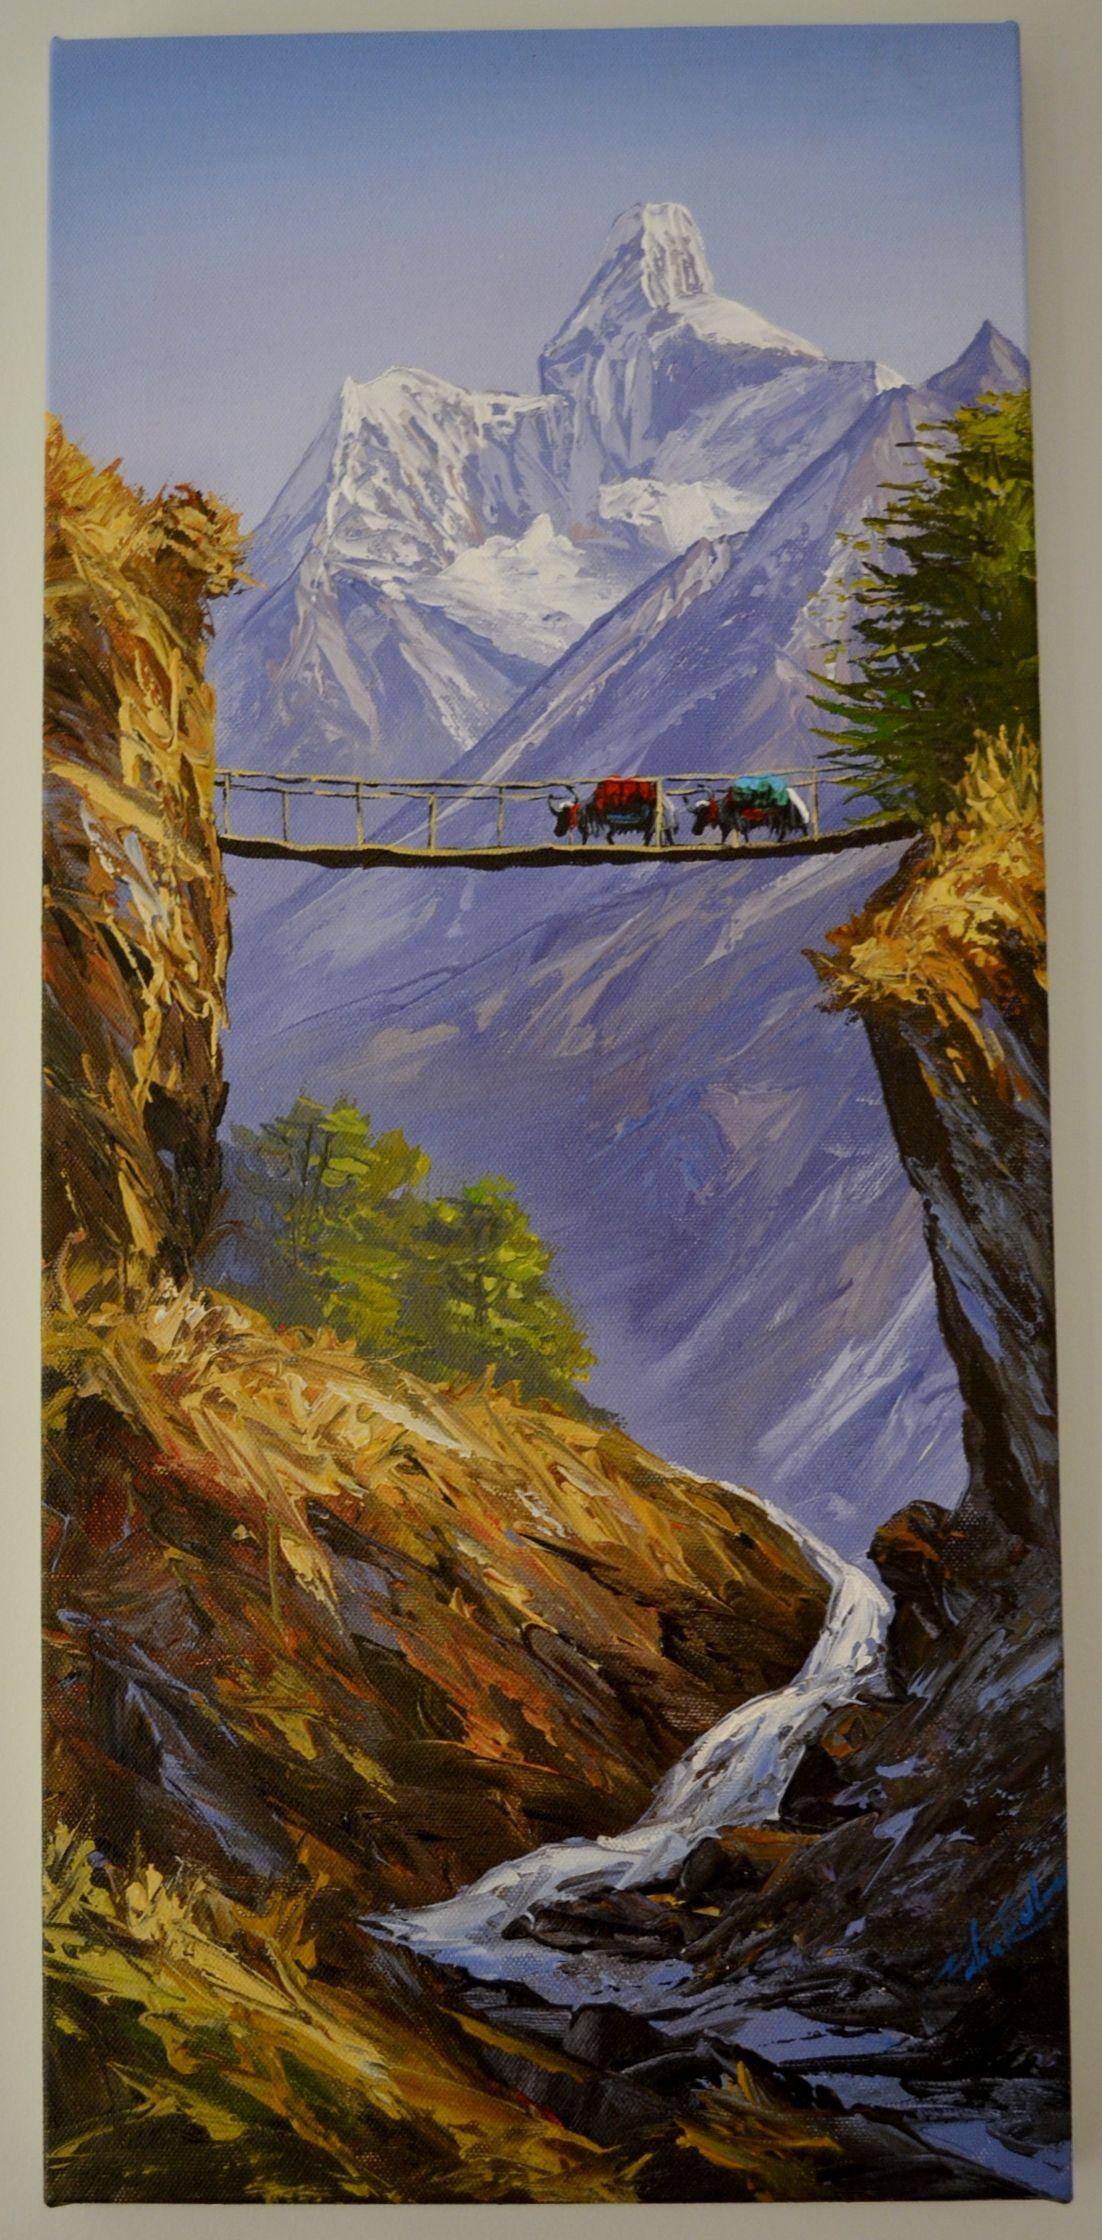 Paintings From Nepal Hanging Bridge Nepal Art Mountain Paintings Watercolor Landscape Paintings